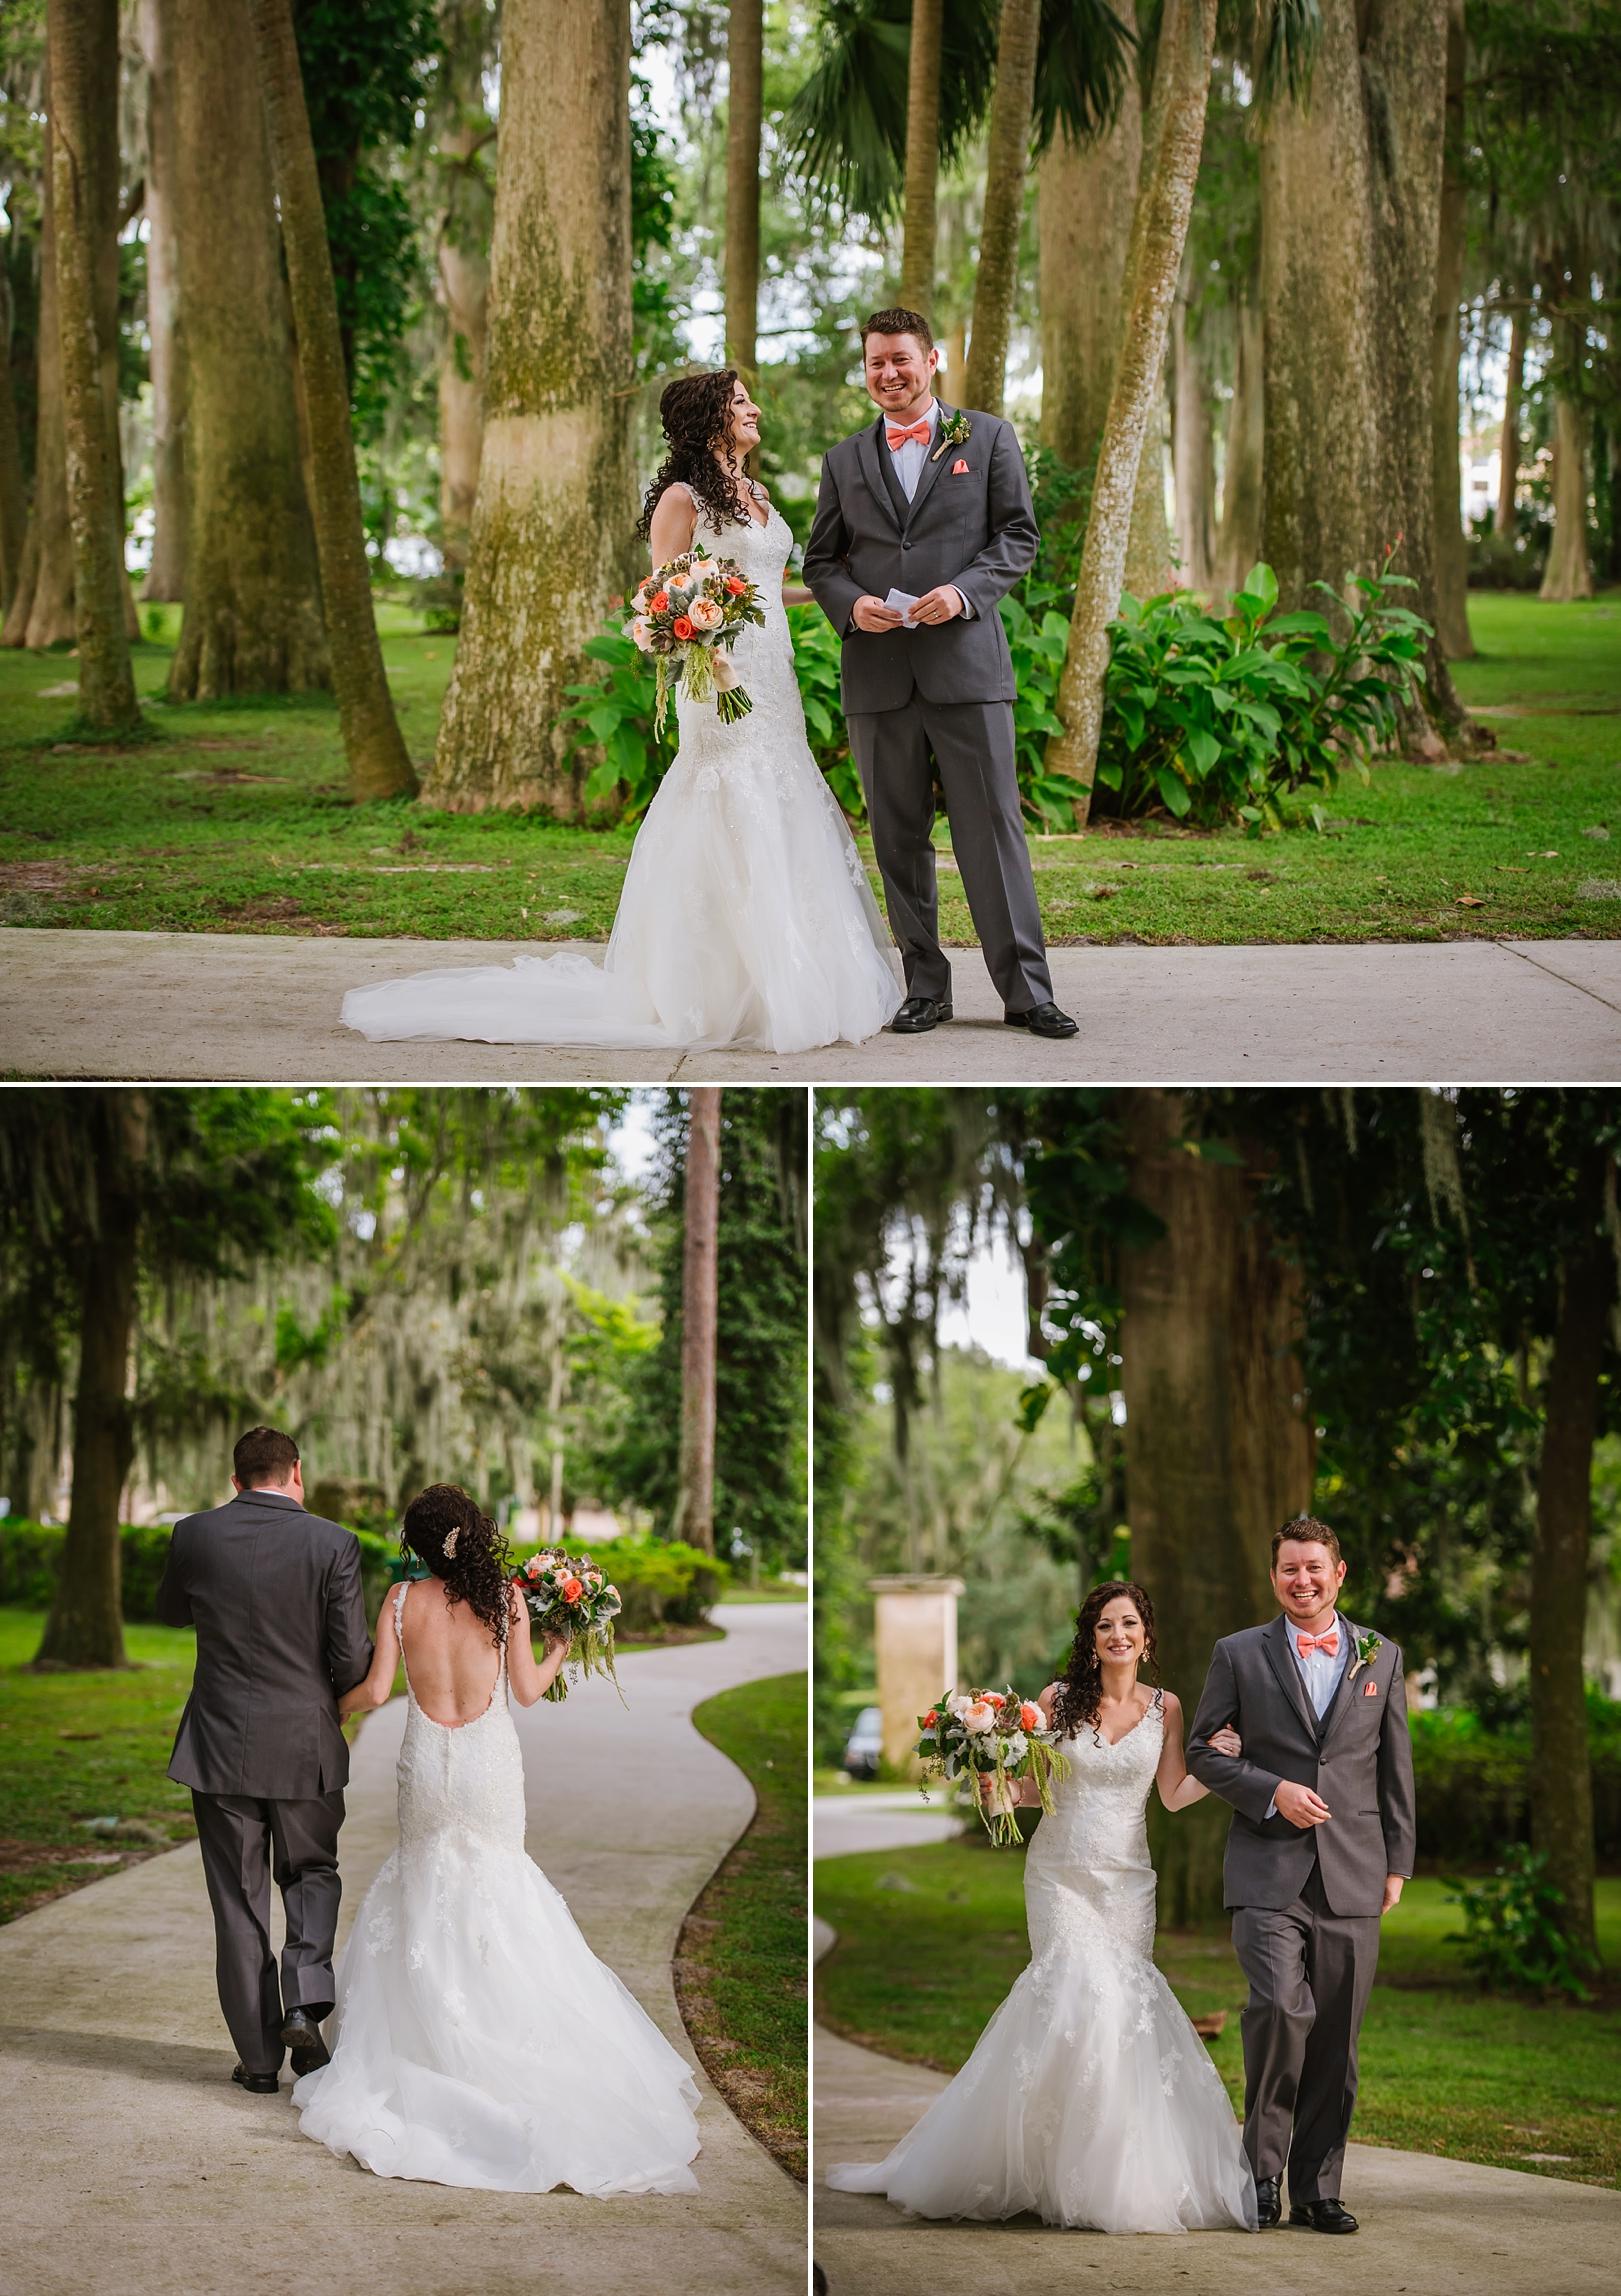 kraft-azalea-gardens-stylish-elopment-wedding-photography_0014.jpg